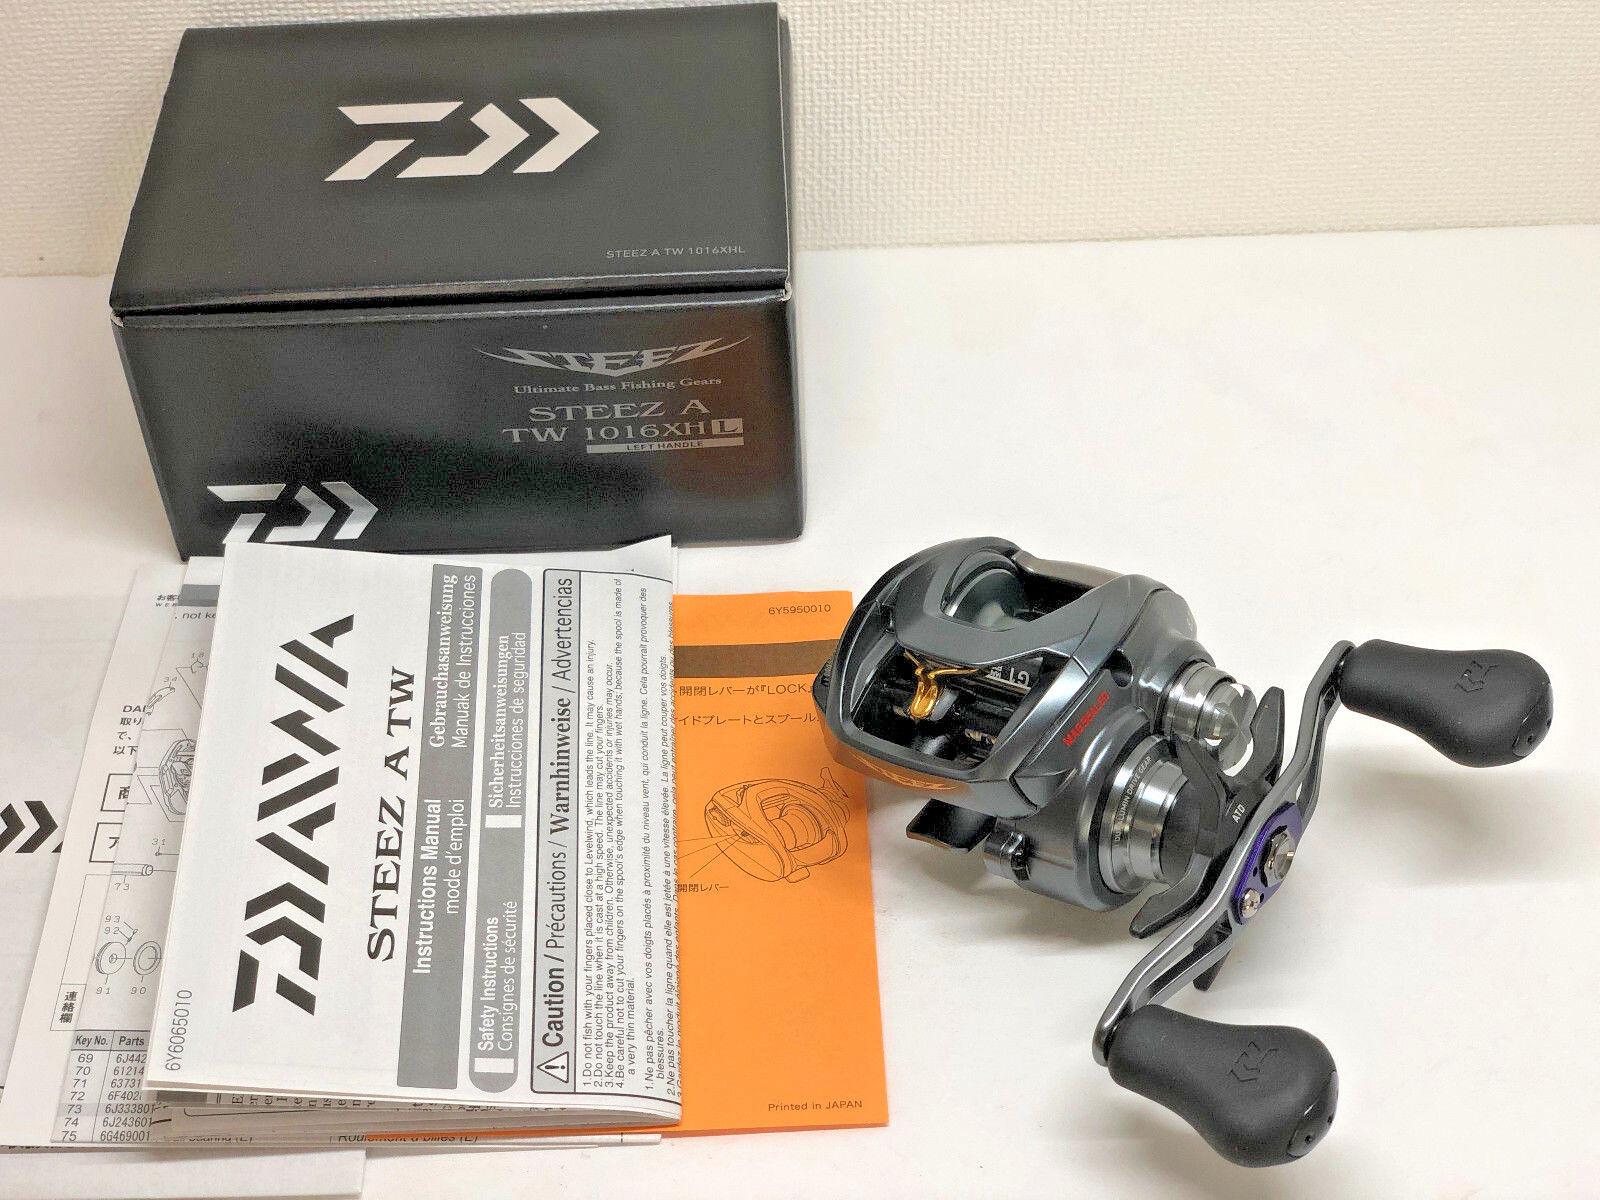 DAIWA 18 STEEZ A TW 1016XHL  - Free Shipping from Japan